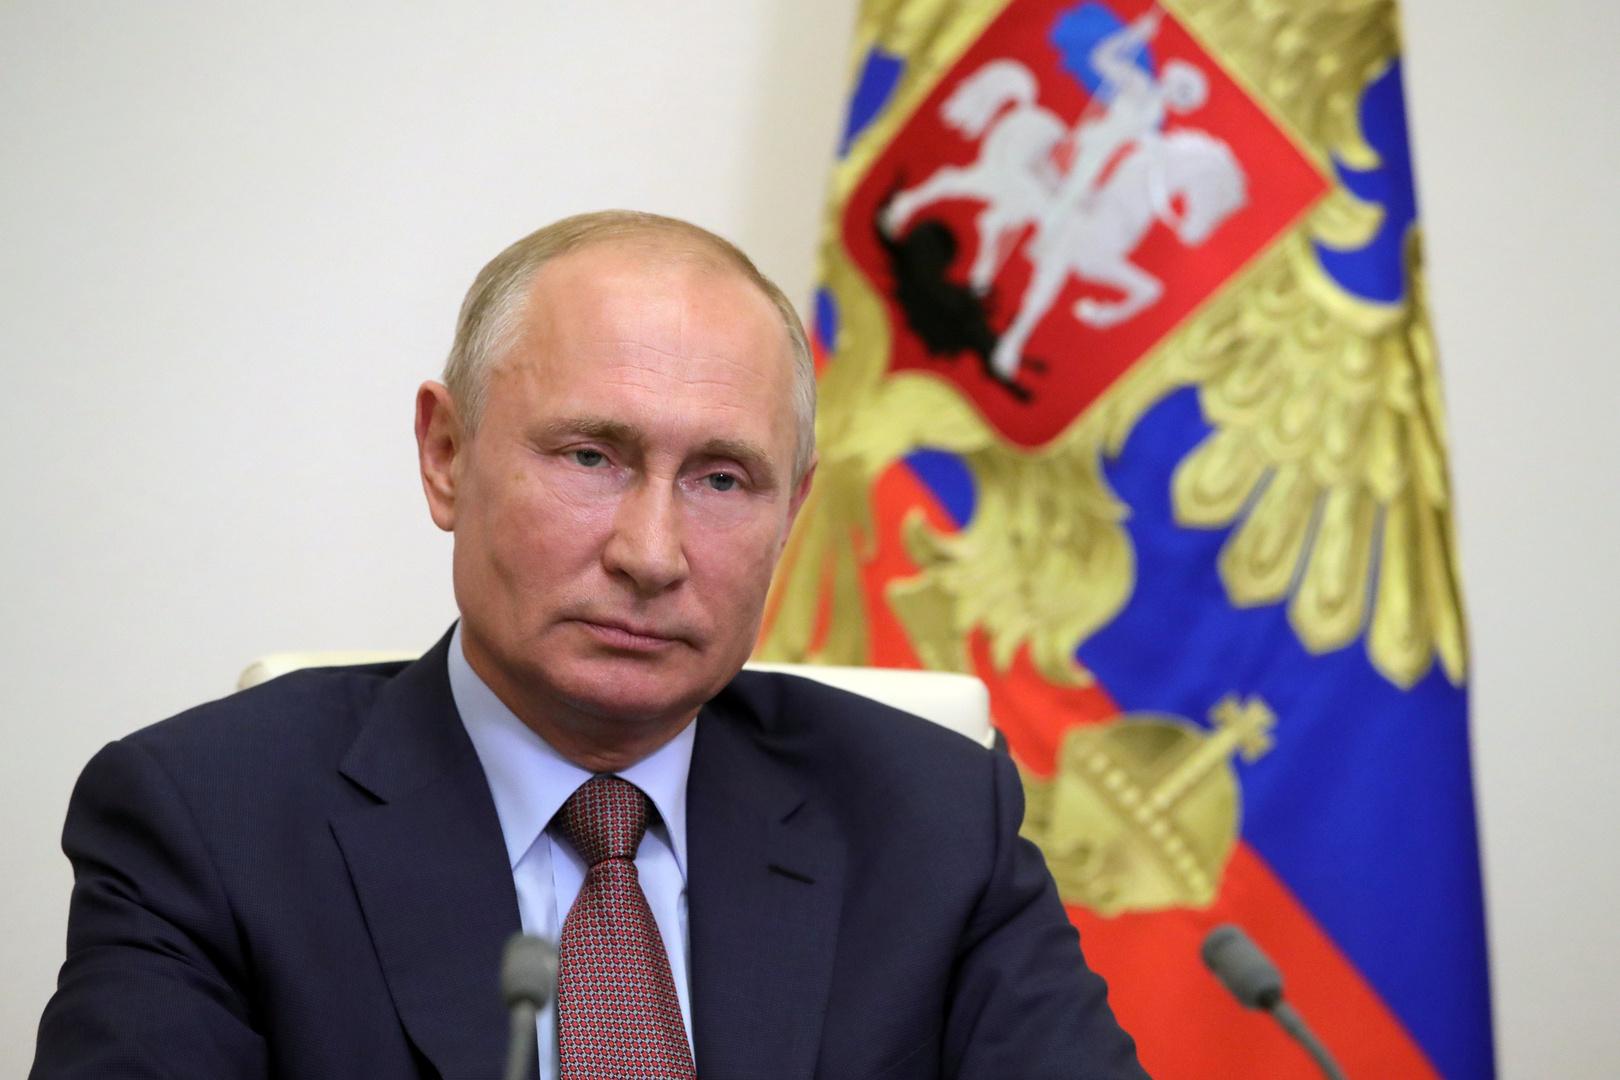 بوتين: روسيا ستزداد نموا بفضل شمالها